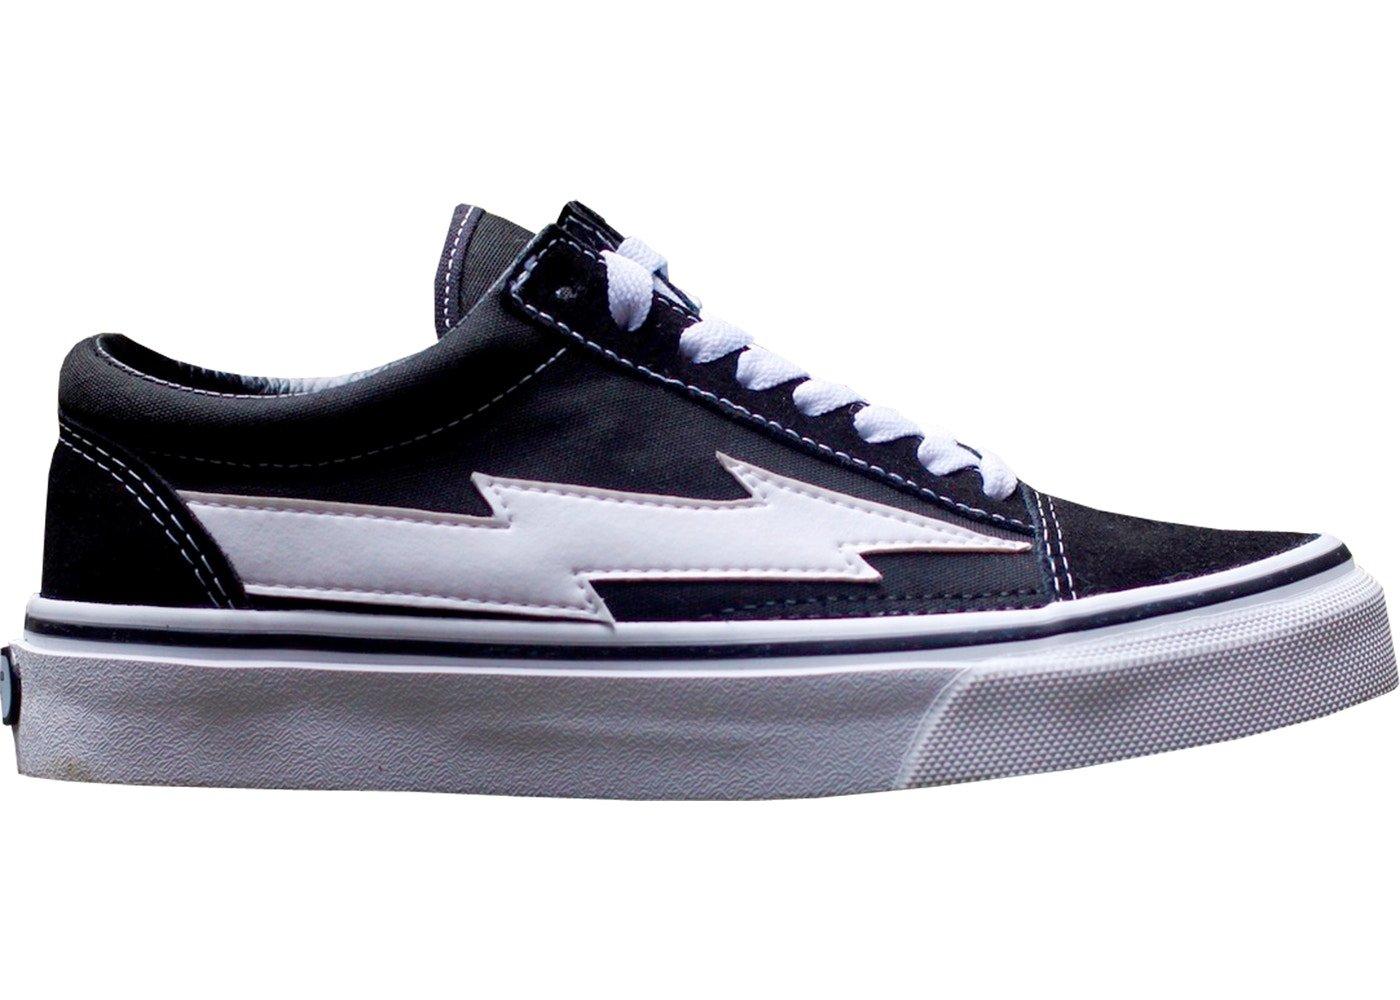 Flash Storm Authentic Heatwave X Factor Fashion Spread Streed Skateboarding II VOL Sneaker B07DXGTXG6 Men US10.5=EU44|Black